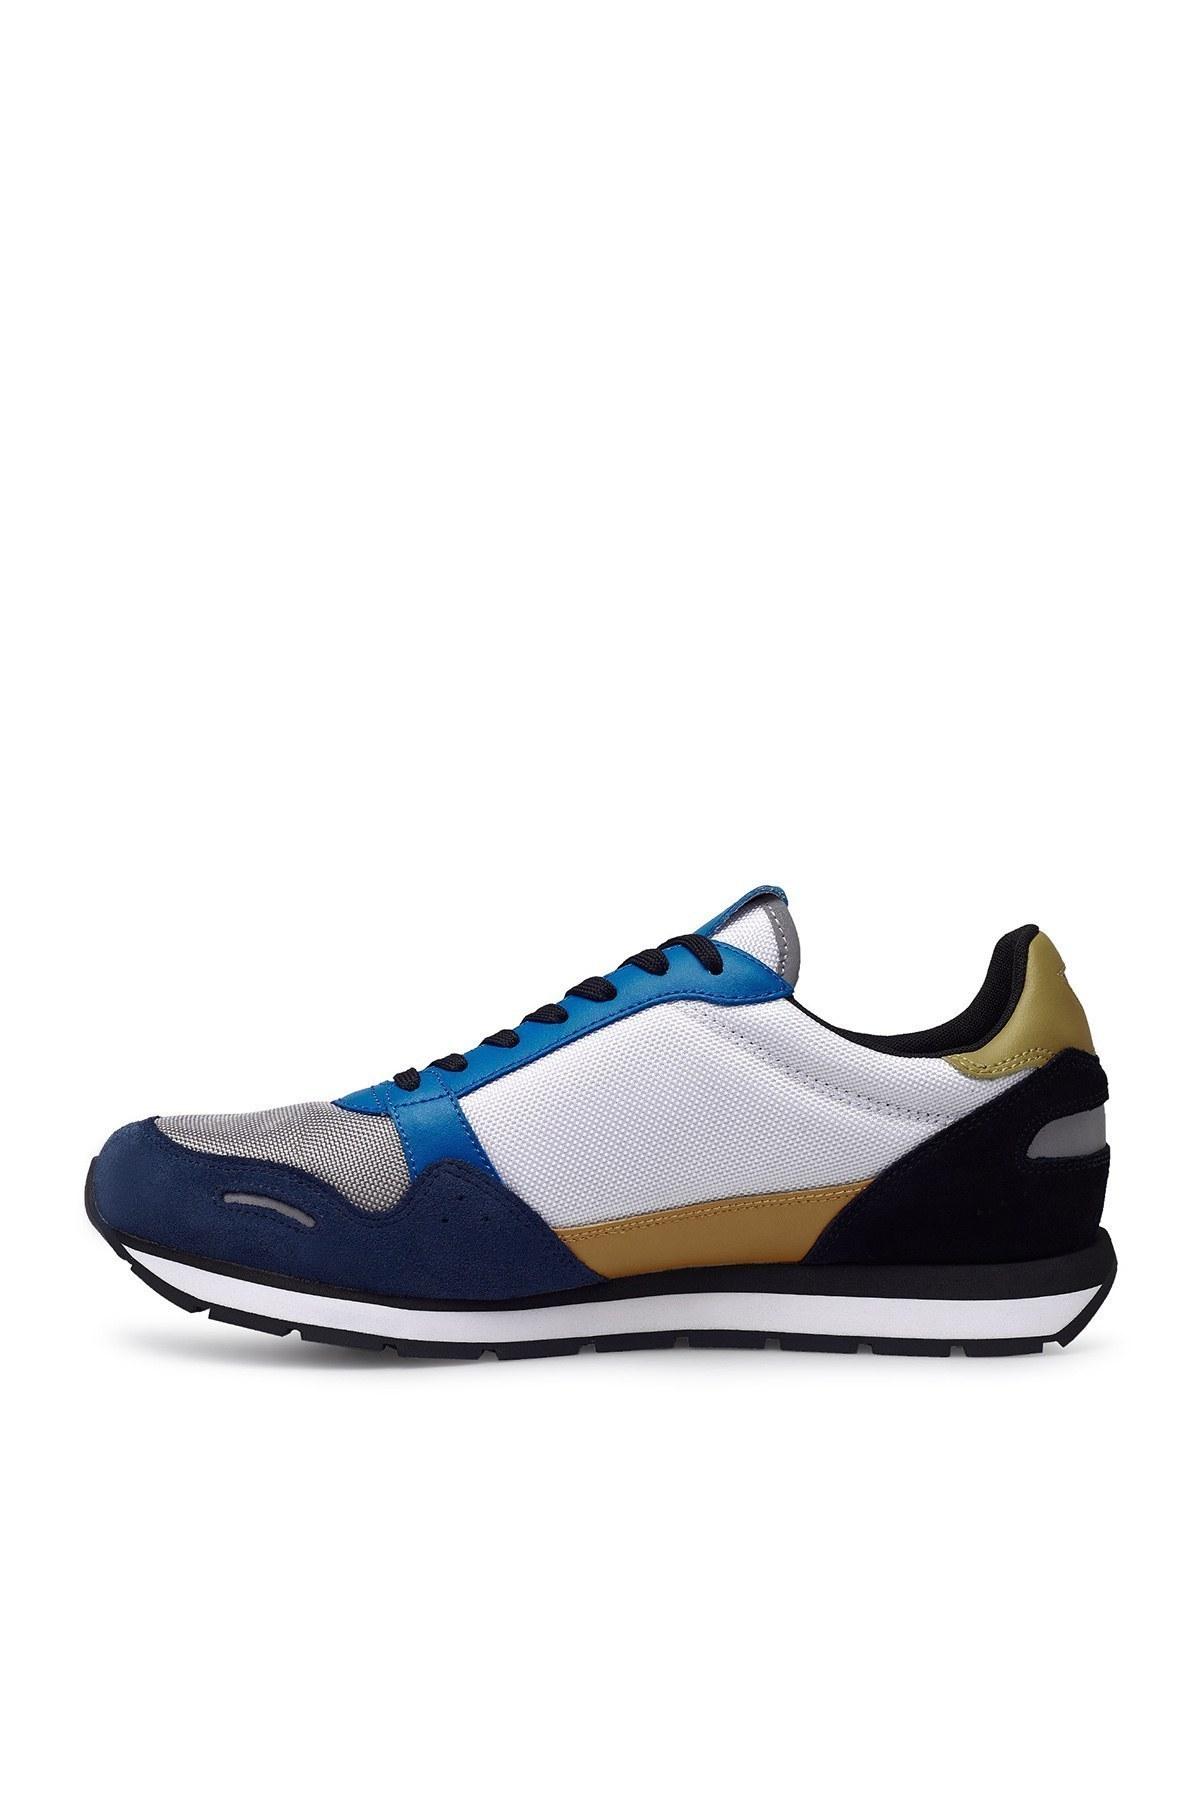 Emporio Armani Sneaker Erkek Ayakkabı X4X215 XM561 N235 SİYAH-MAVİ